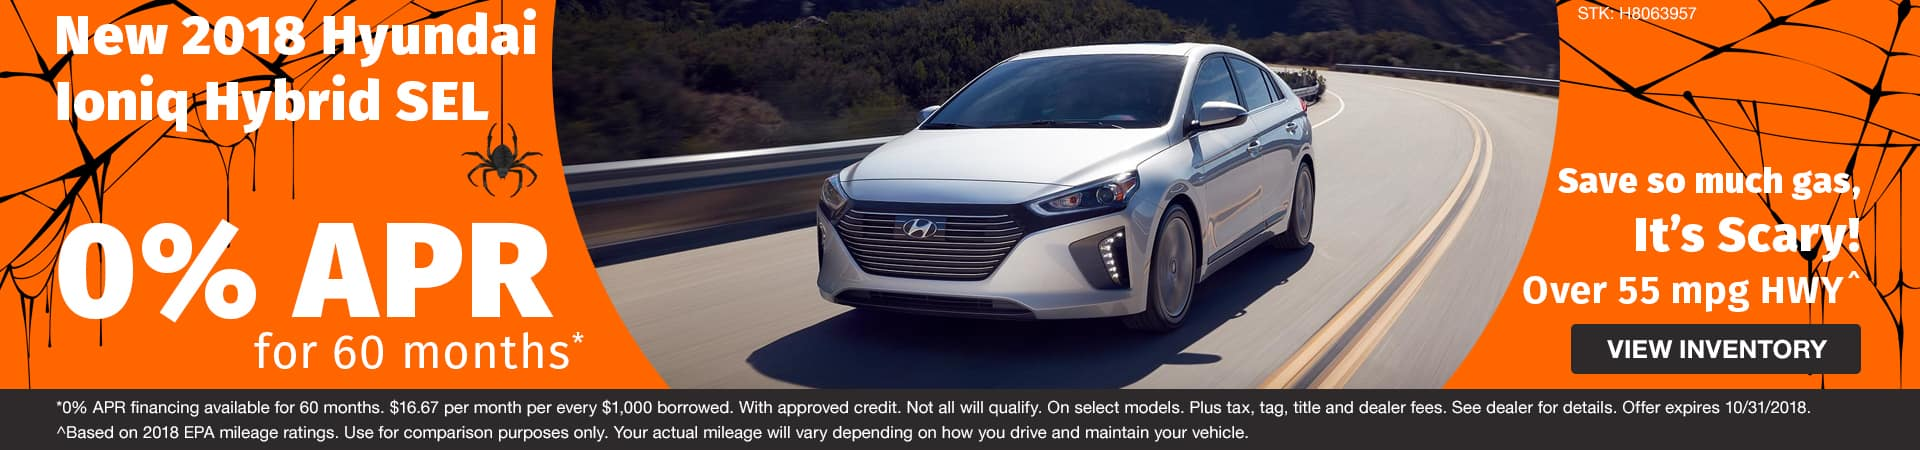 Get 0% APR on a New 2018 Hyundai Ioniq Hybrid SEL in Murfreesboro TN